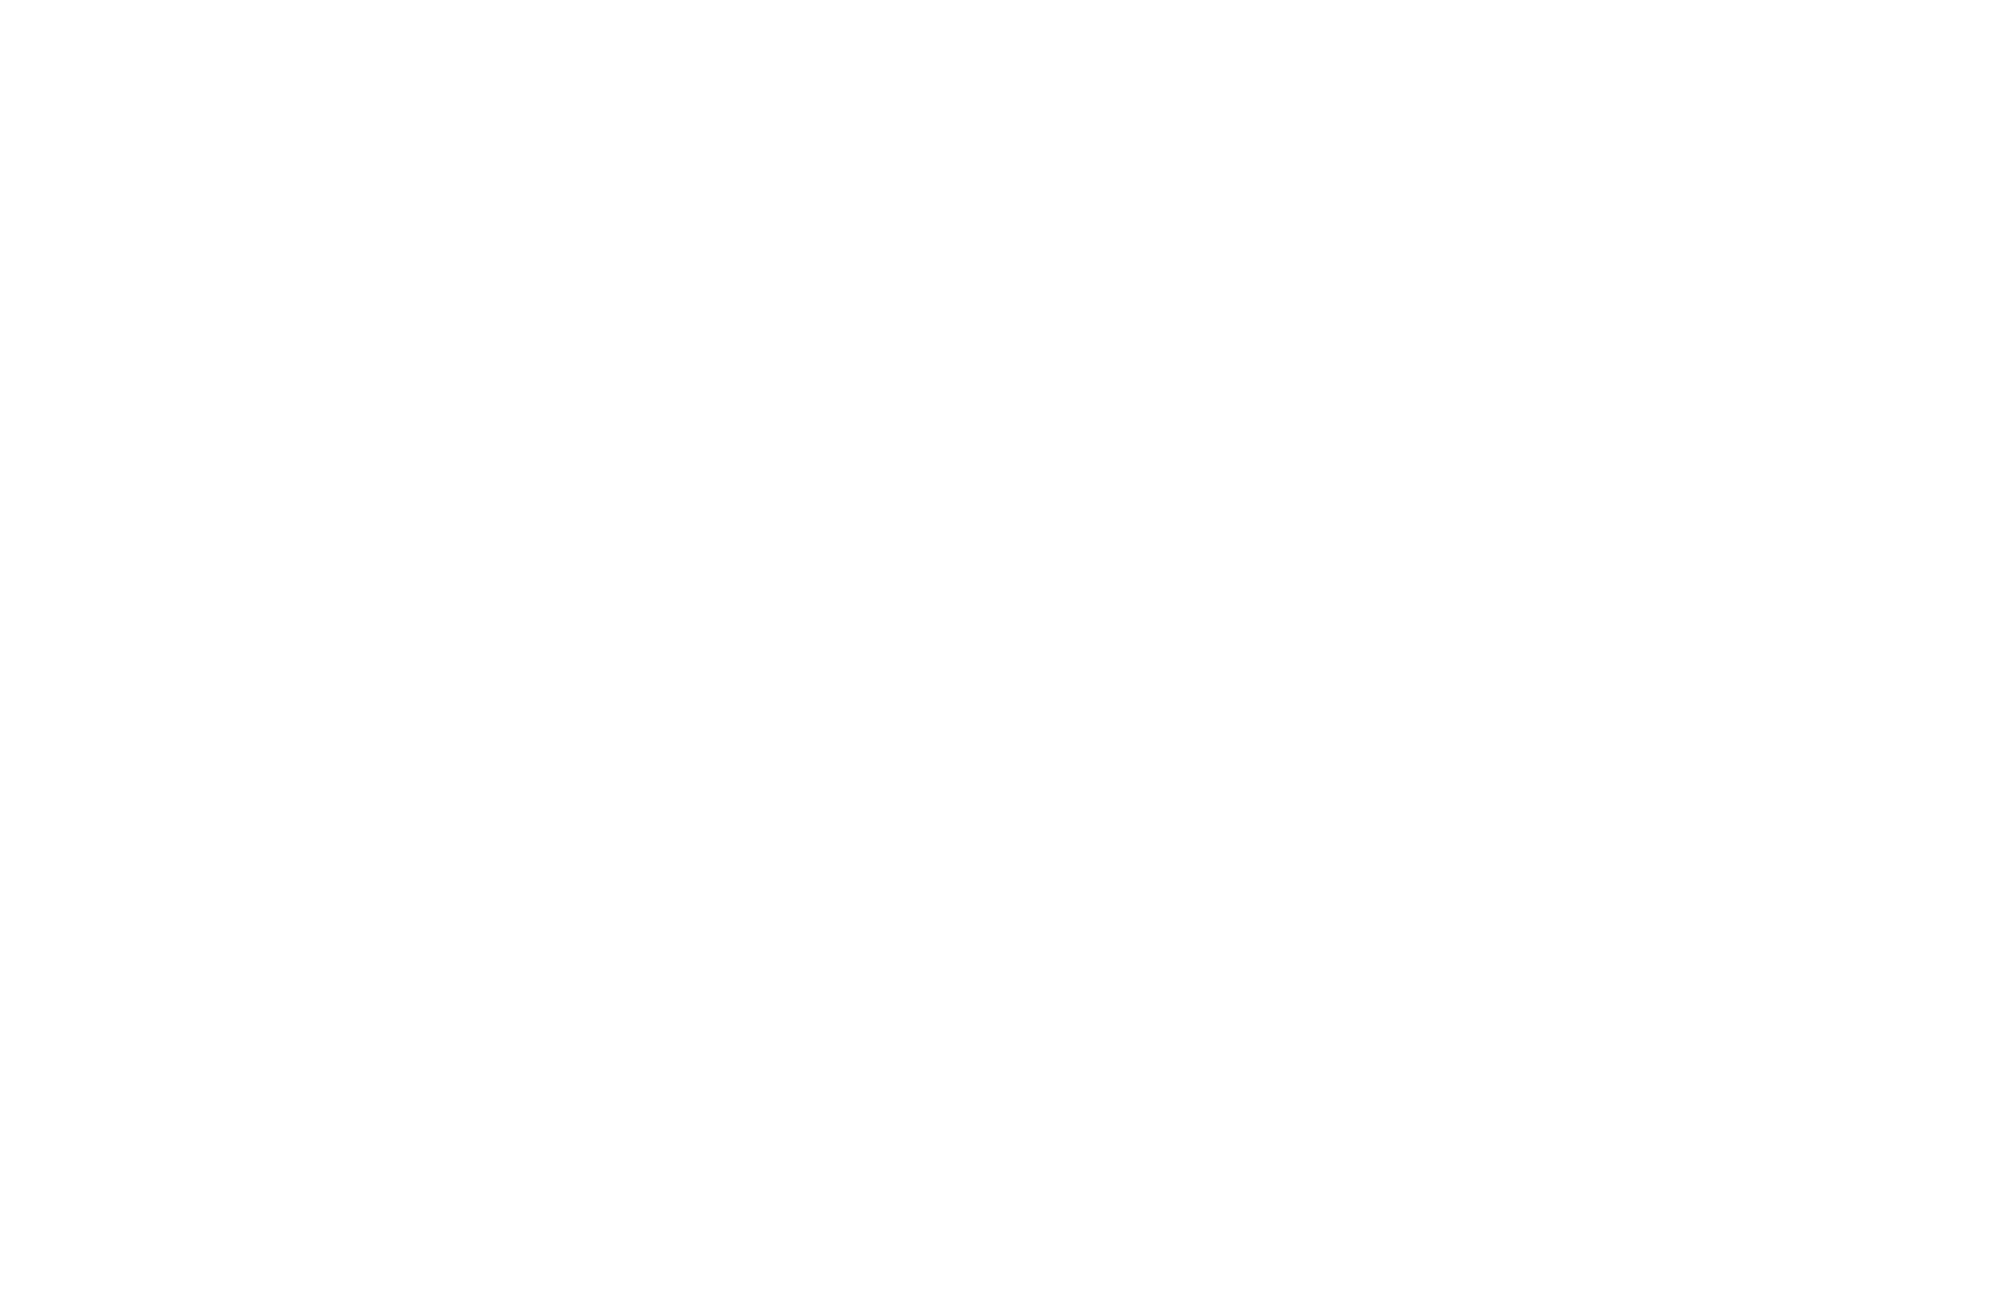 QUESTKMS.RU